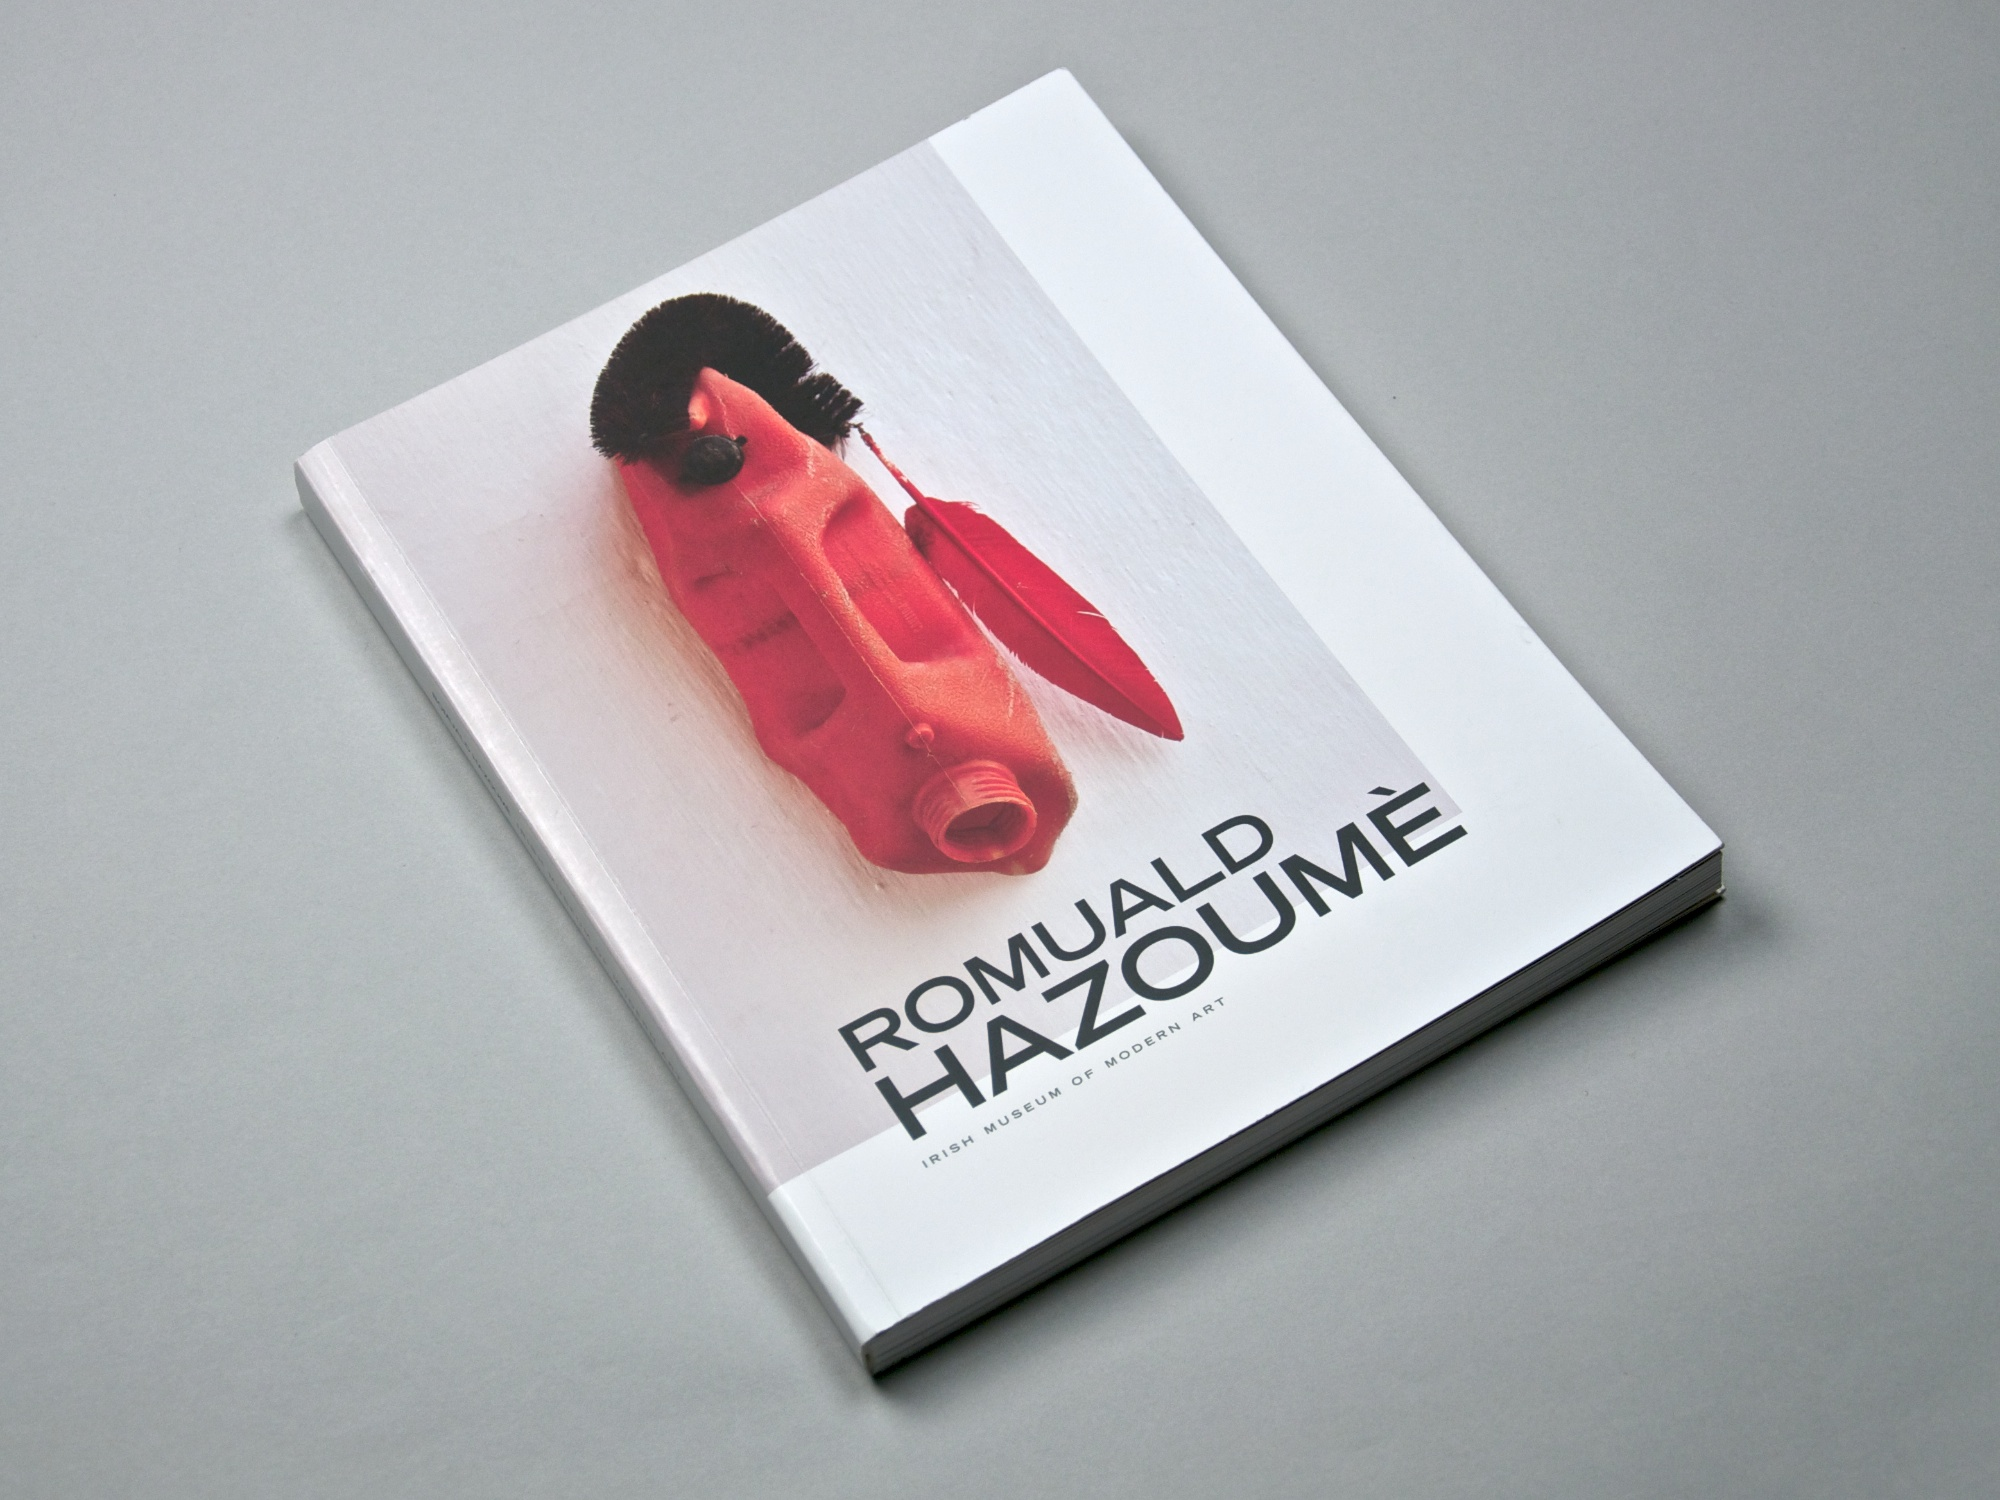 Cover image: Romuald Hazoumè Catalogue (2011)